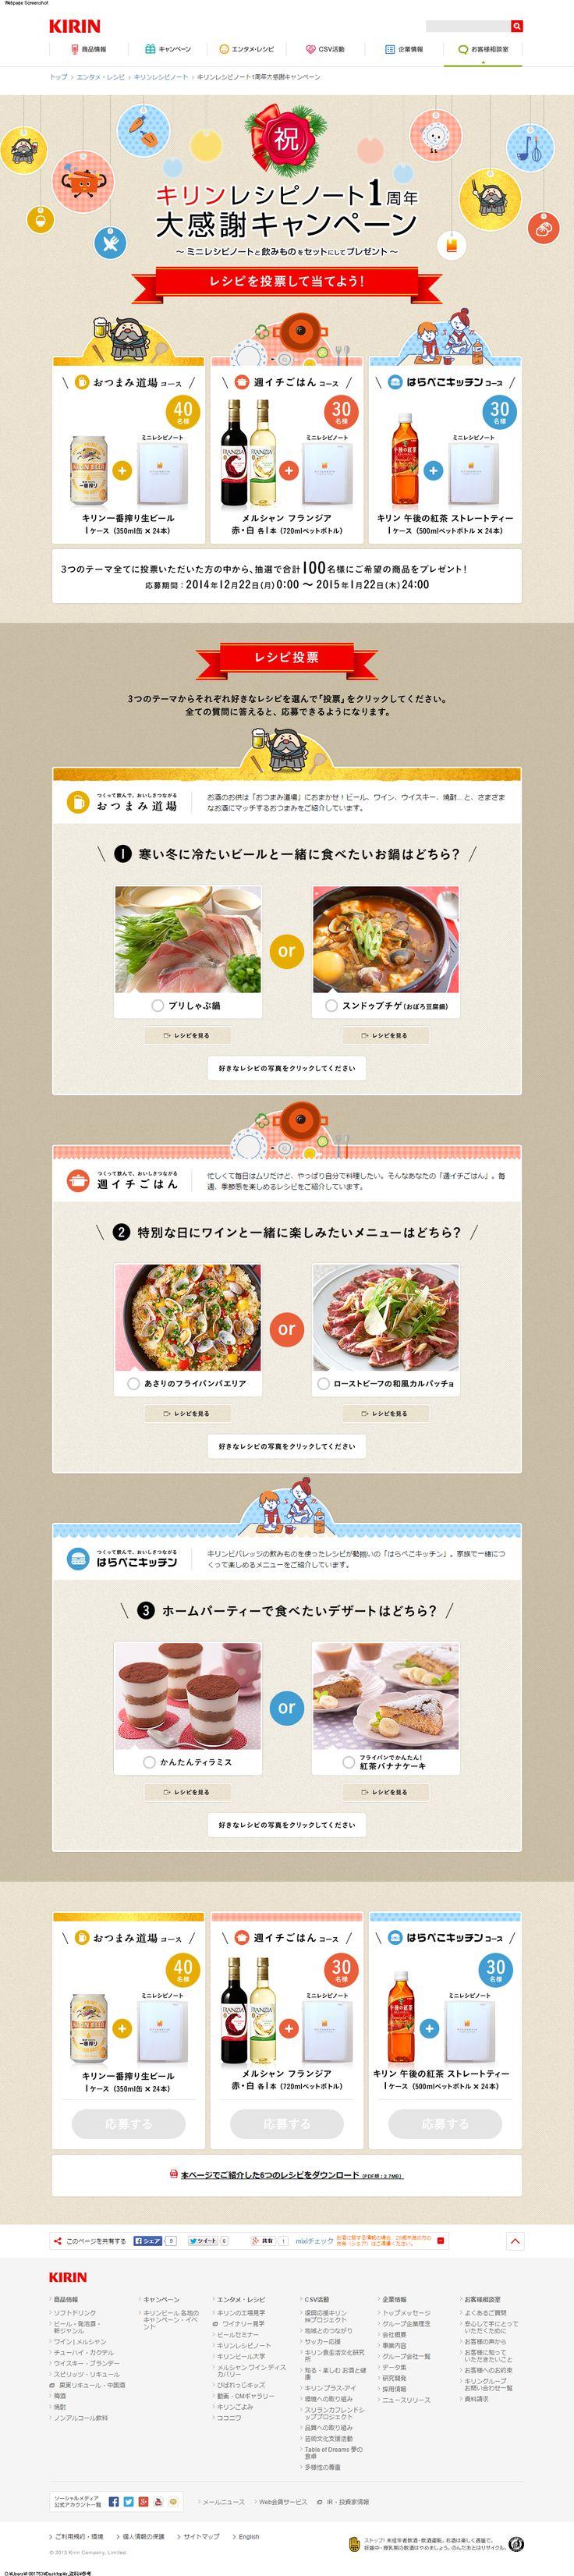 http://recipe.kirin.co.jp/thanks_campaign/index.html